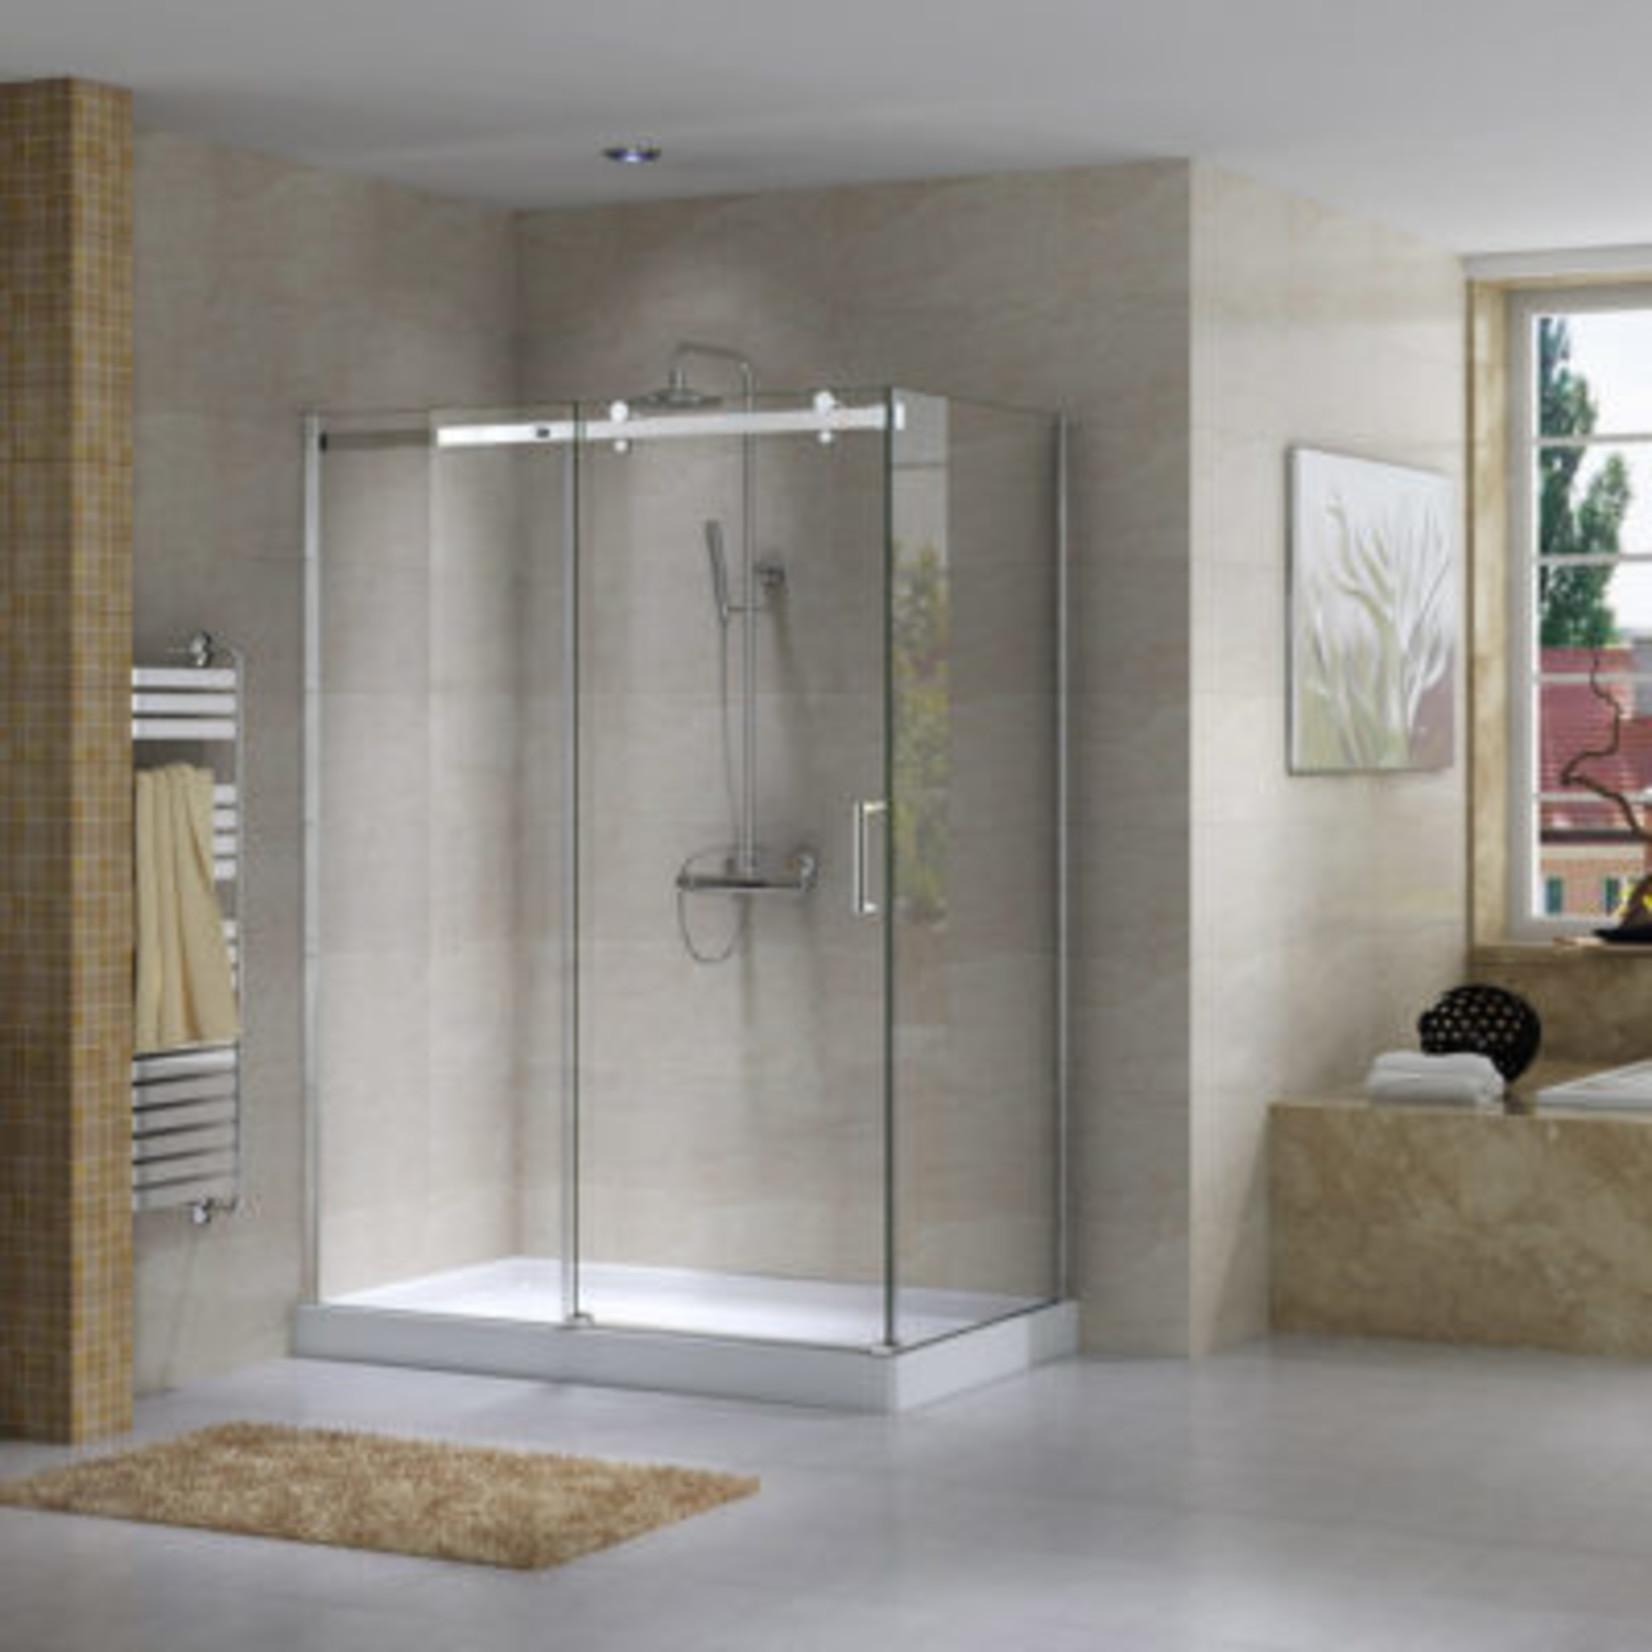 Reversible shower set 36x60 chrome Quartz Jade series